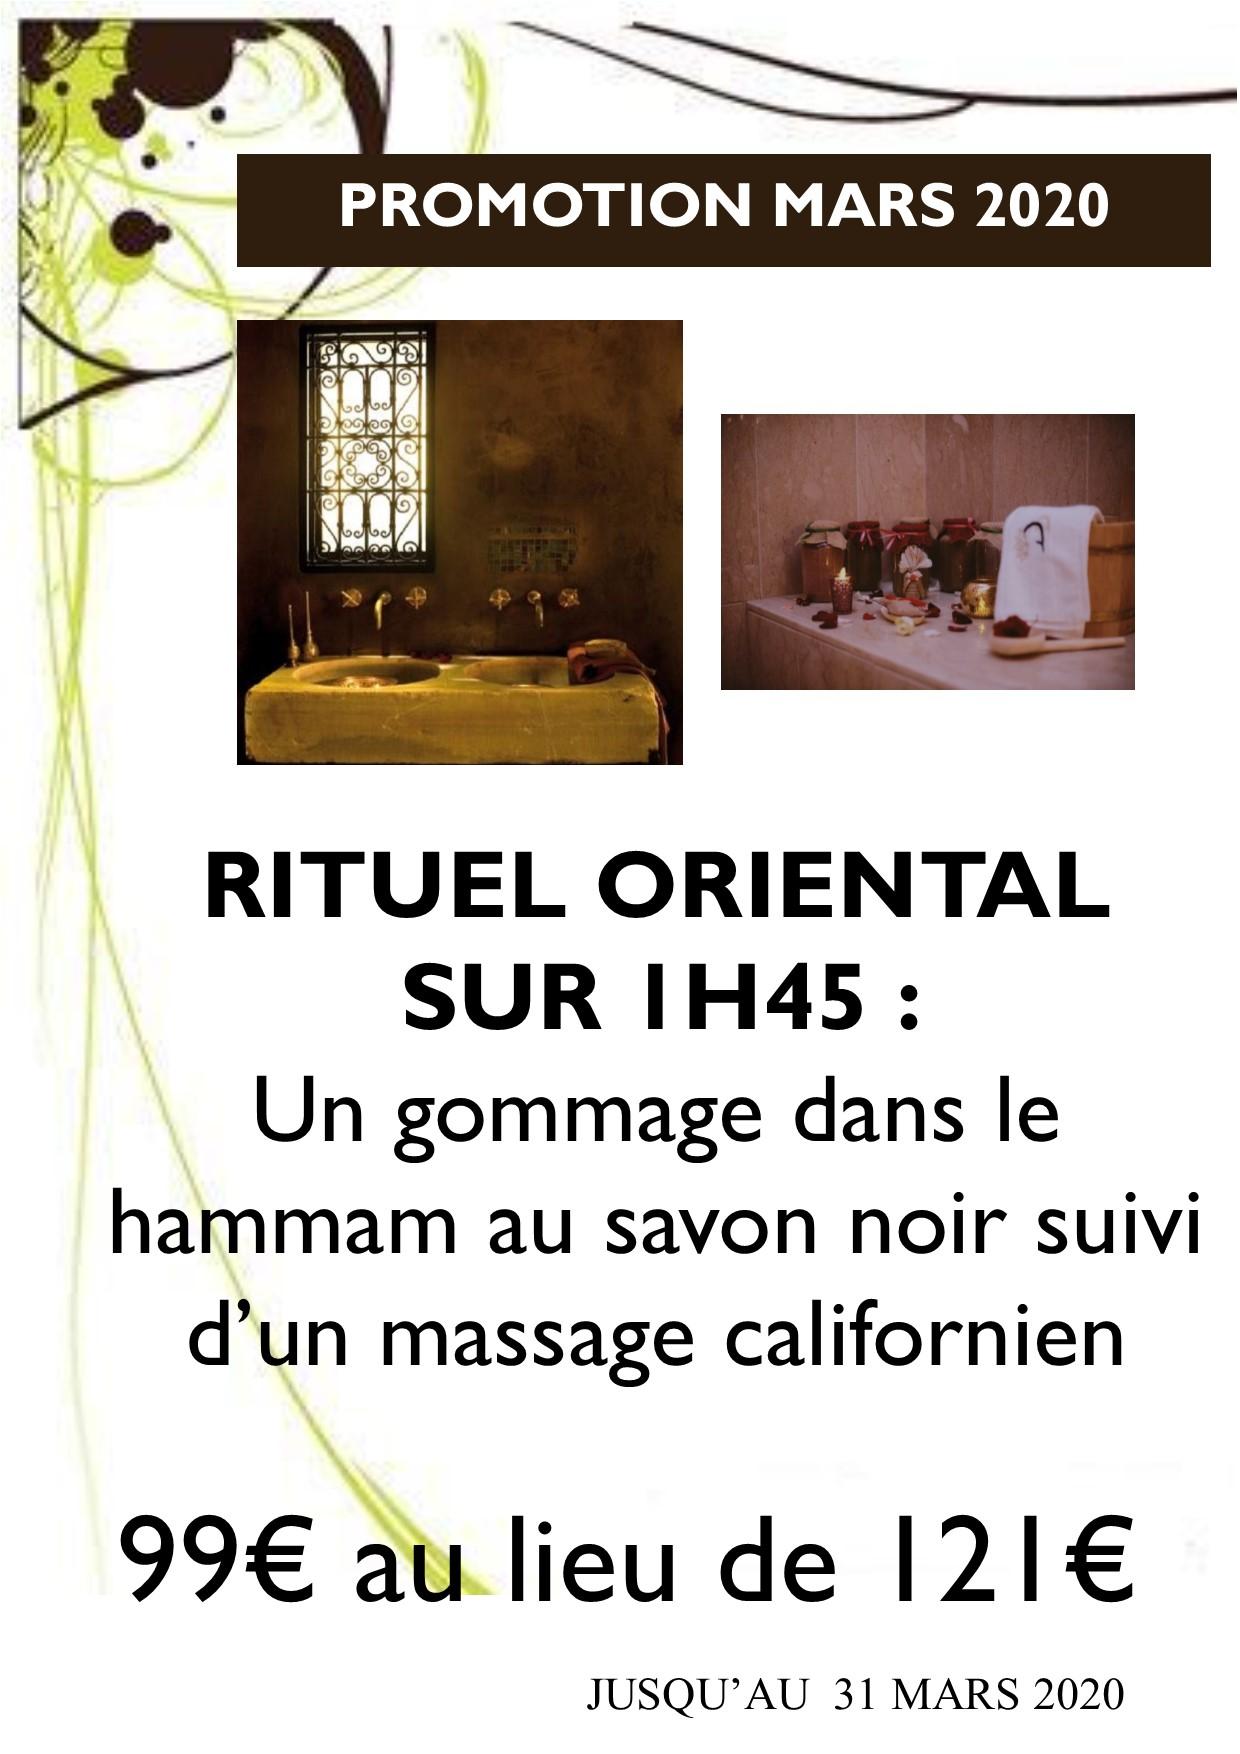 1h45 gommage dans hammam  et massage